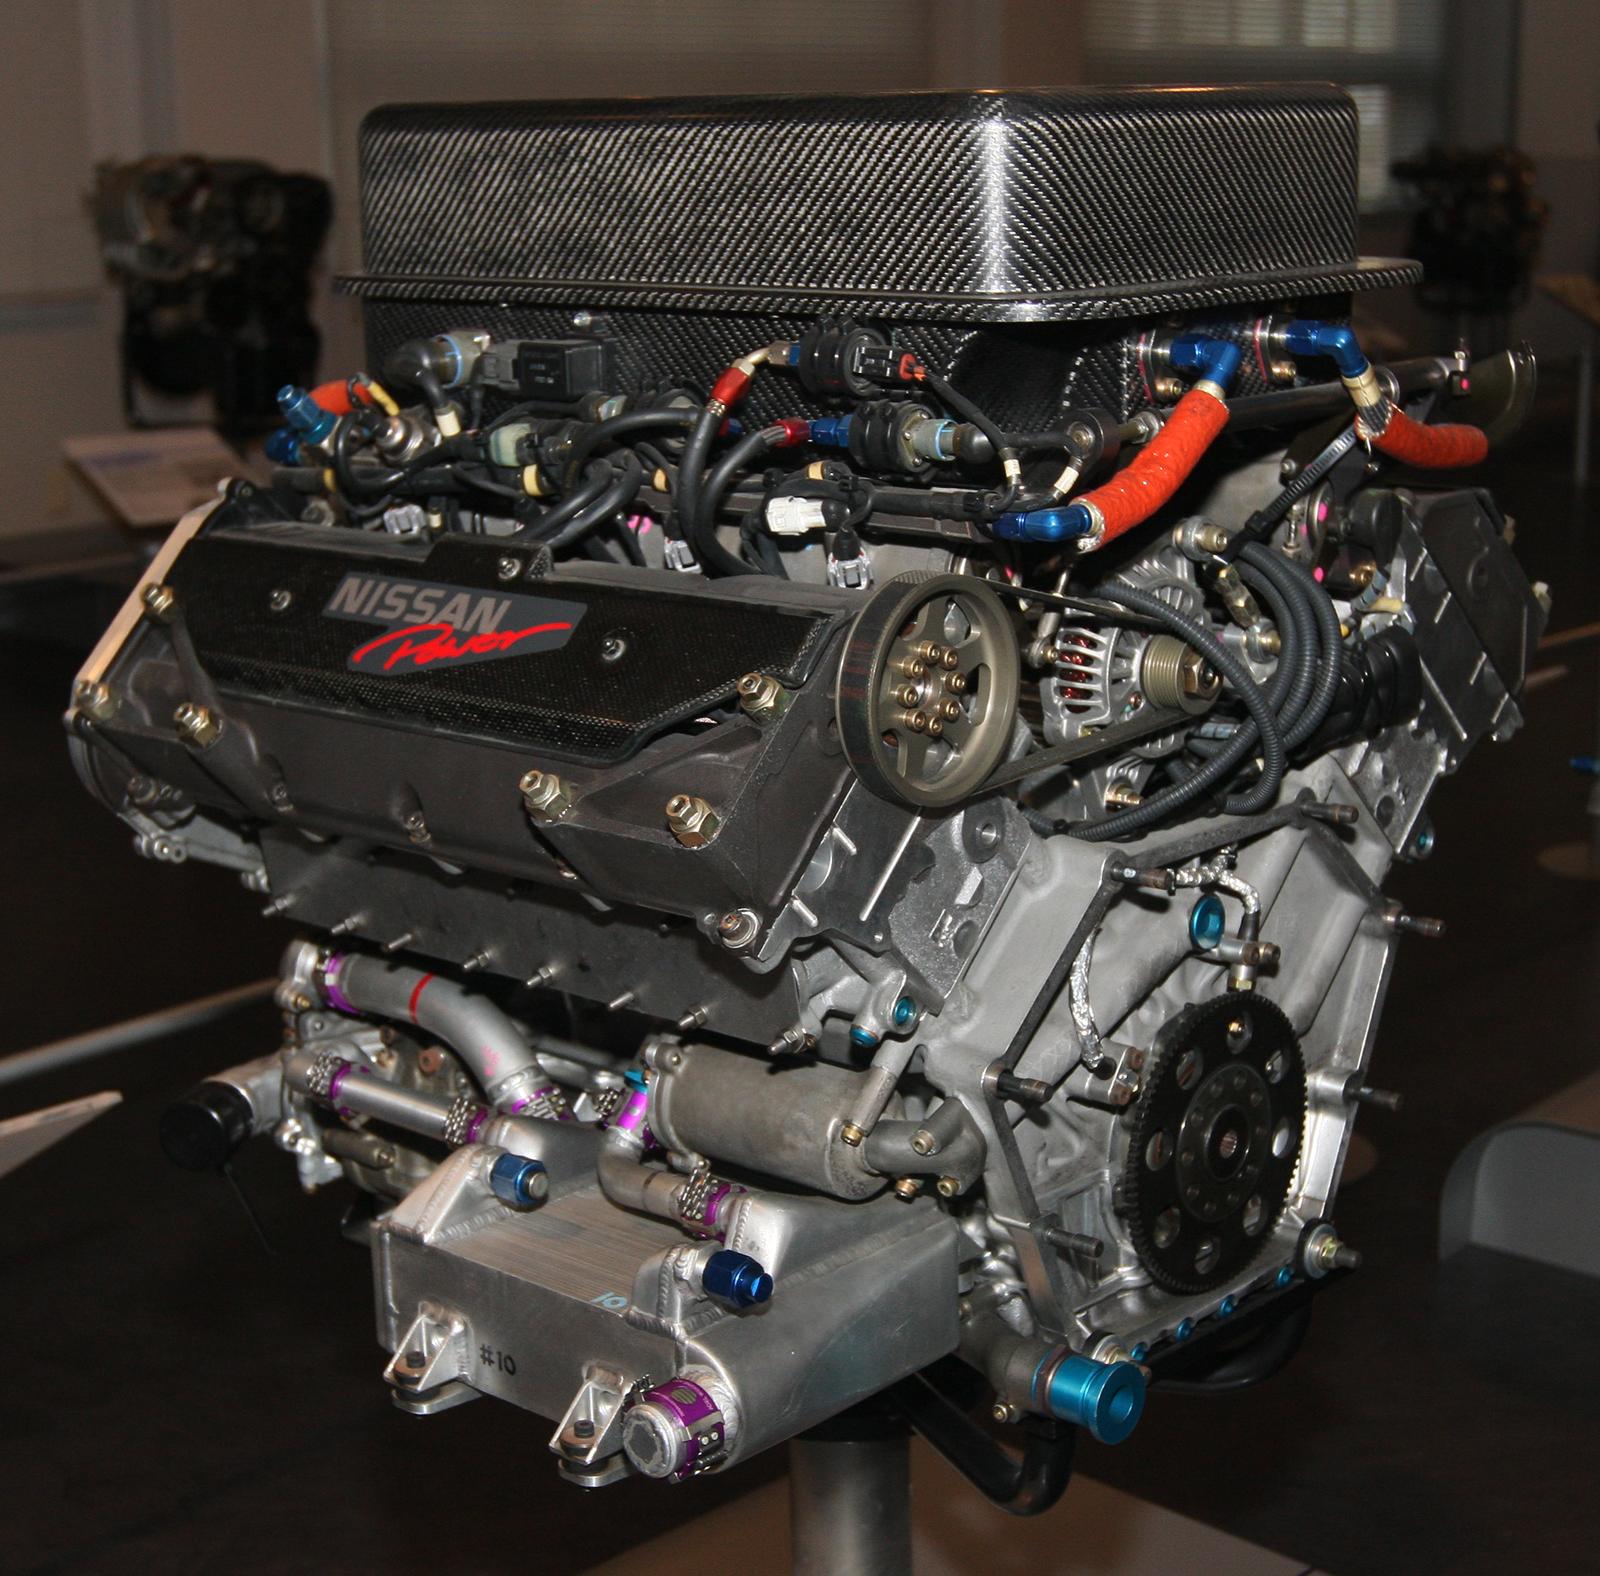 Nissan Titan Forum Nismo Vk56de